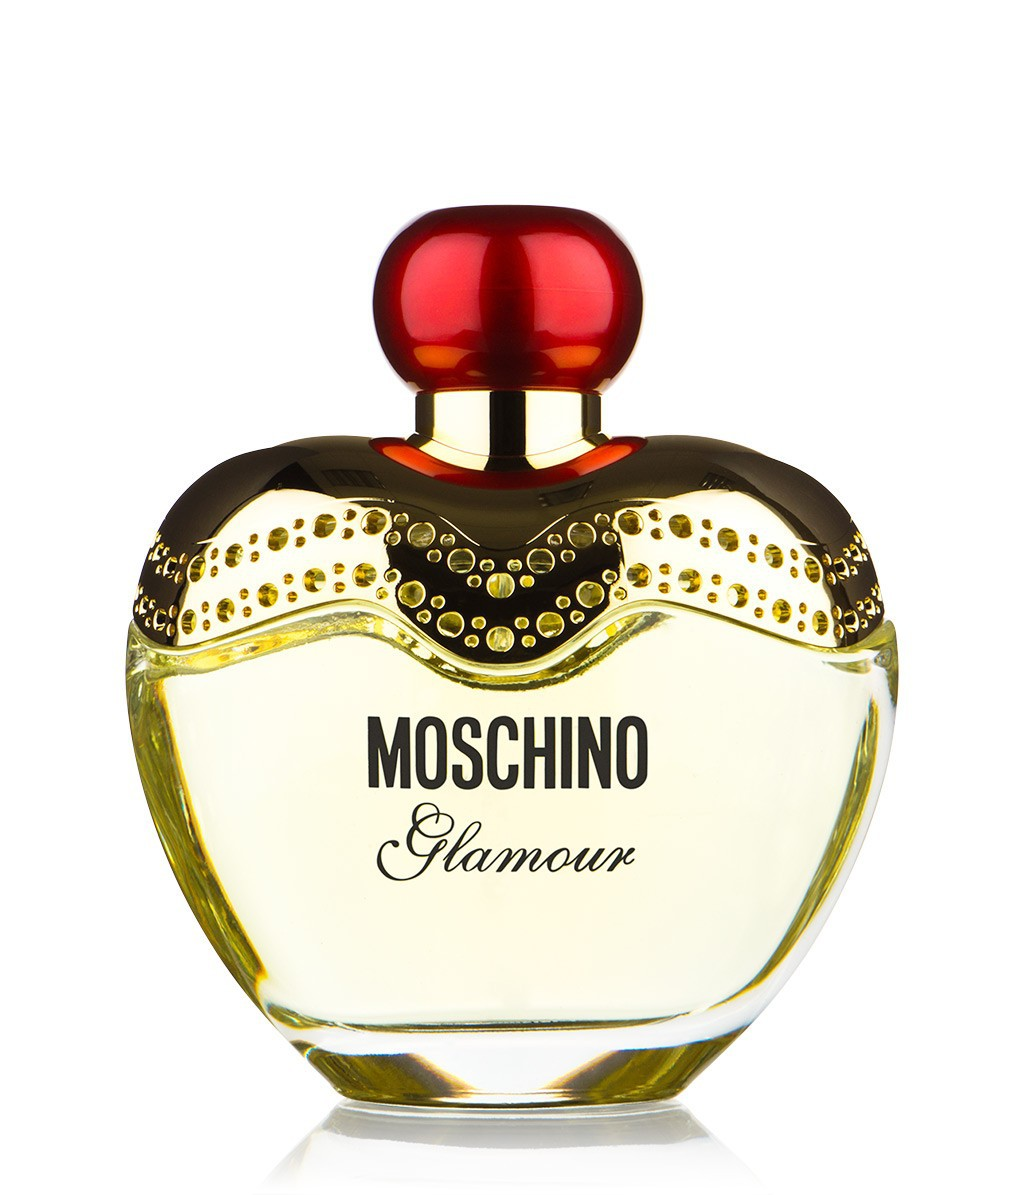 Moschino Glamour аромат для женщин